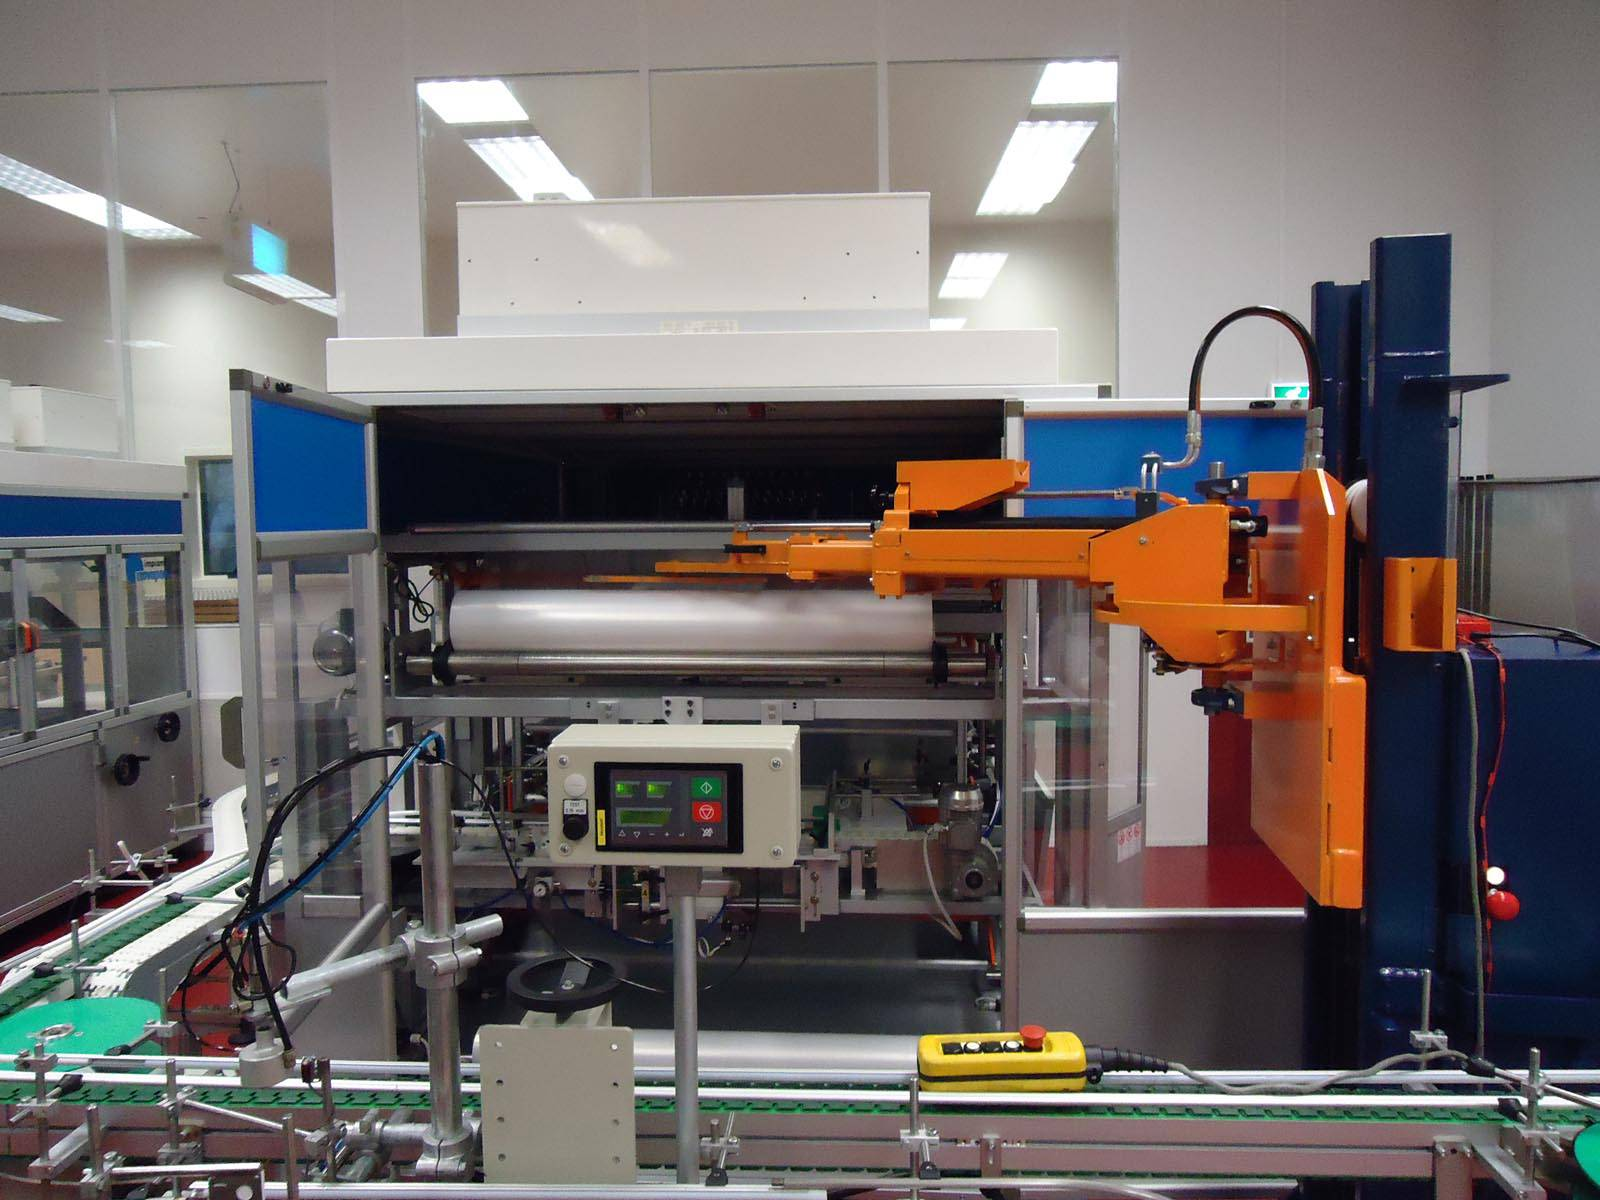 Machinebouw - Folie verpakkingsmachine   amtgroup.nl